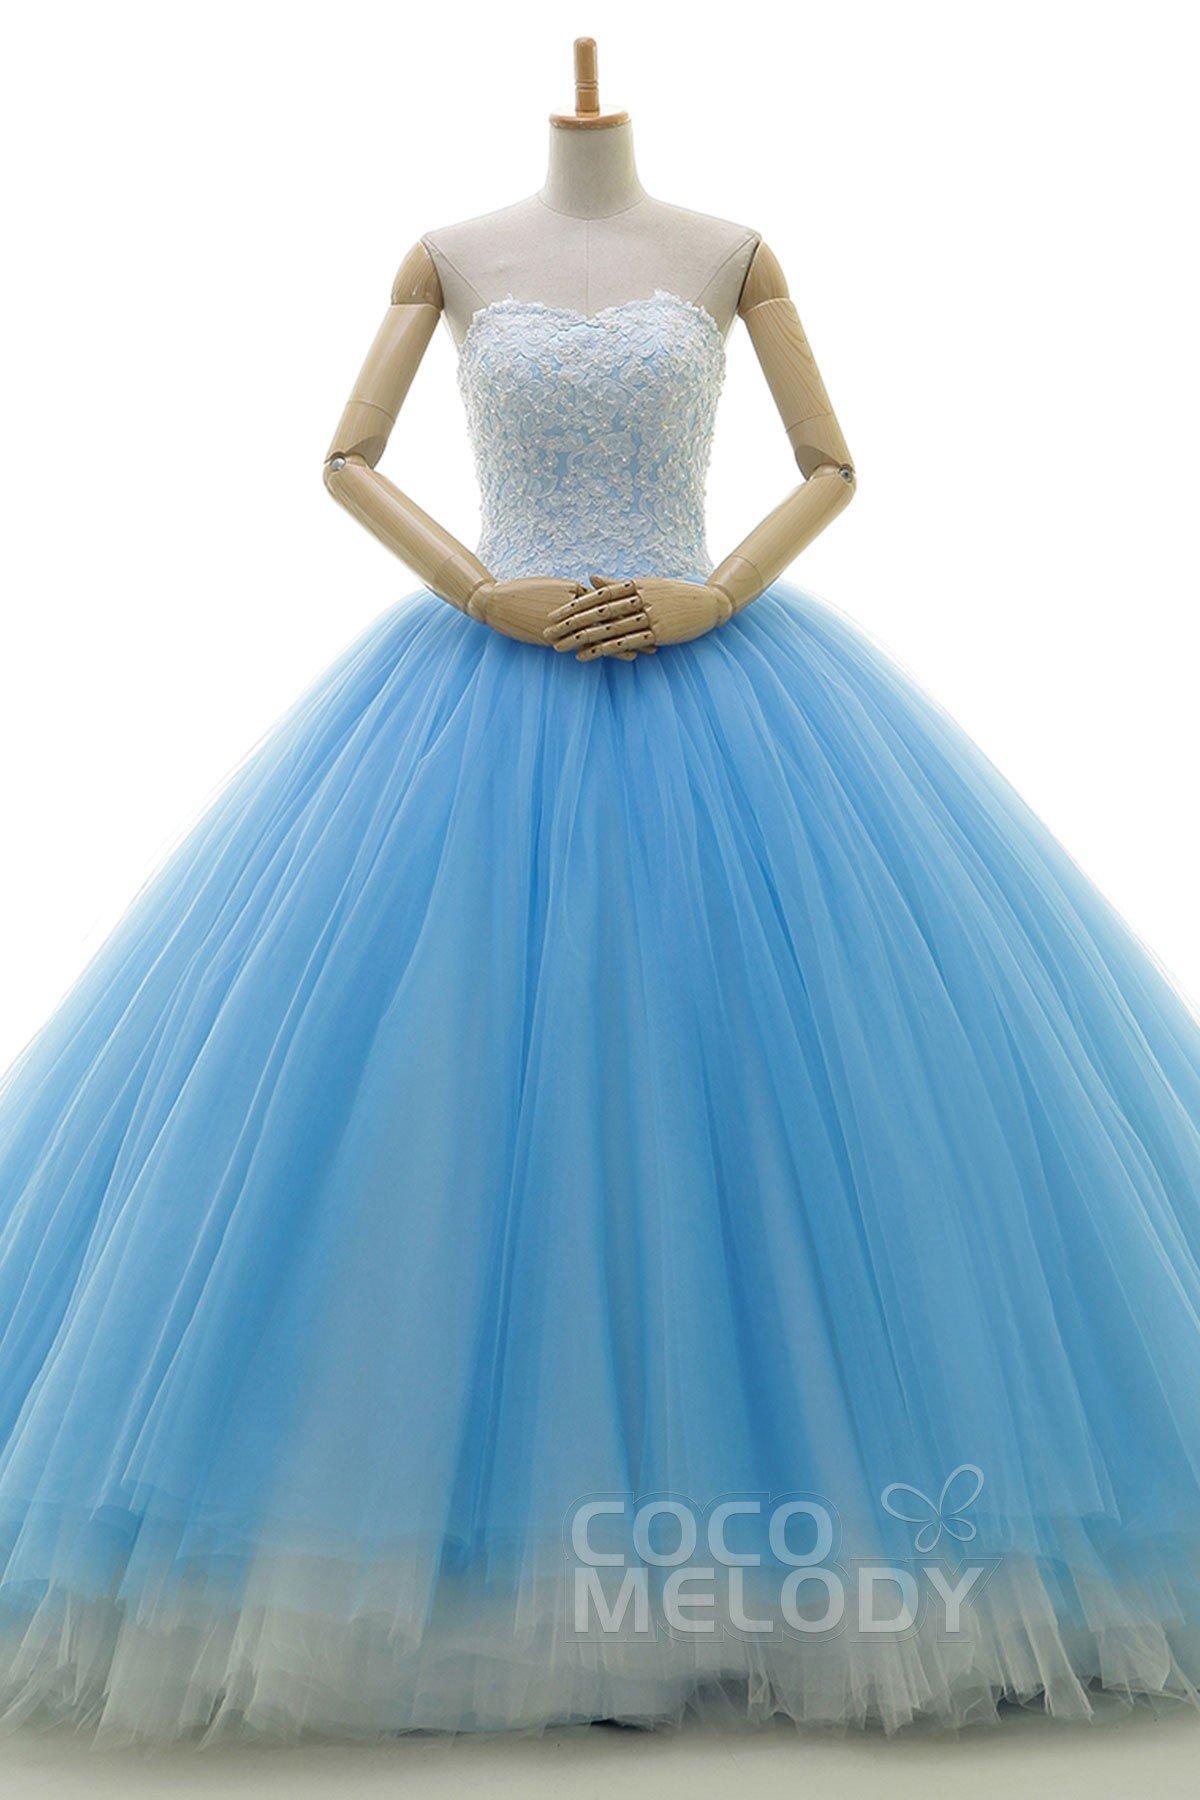 Cocomelody: Princess Chapel Train Tulle Wedding Dress Beading ...